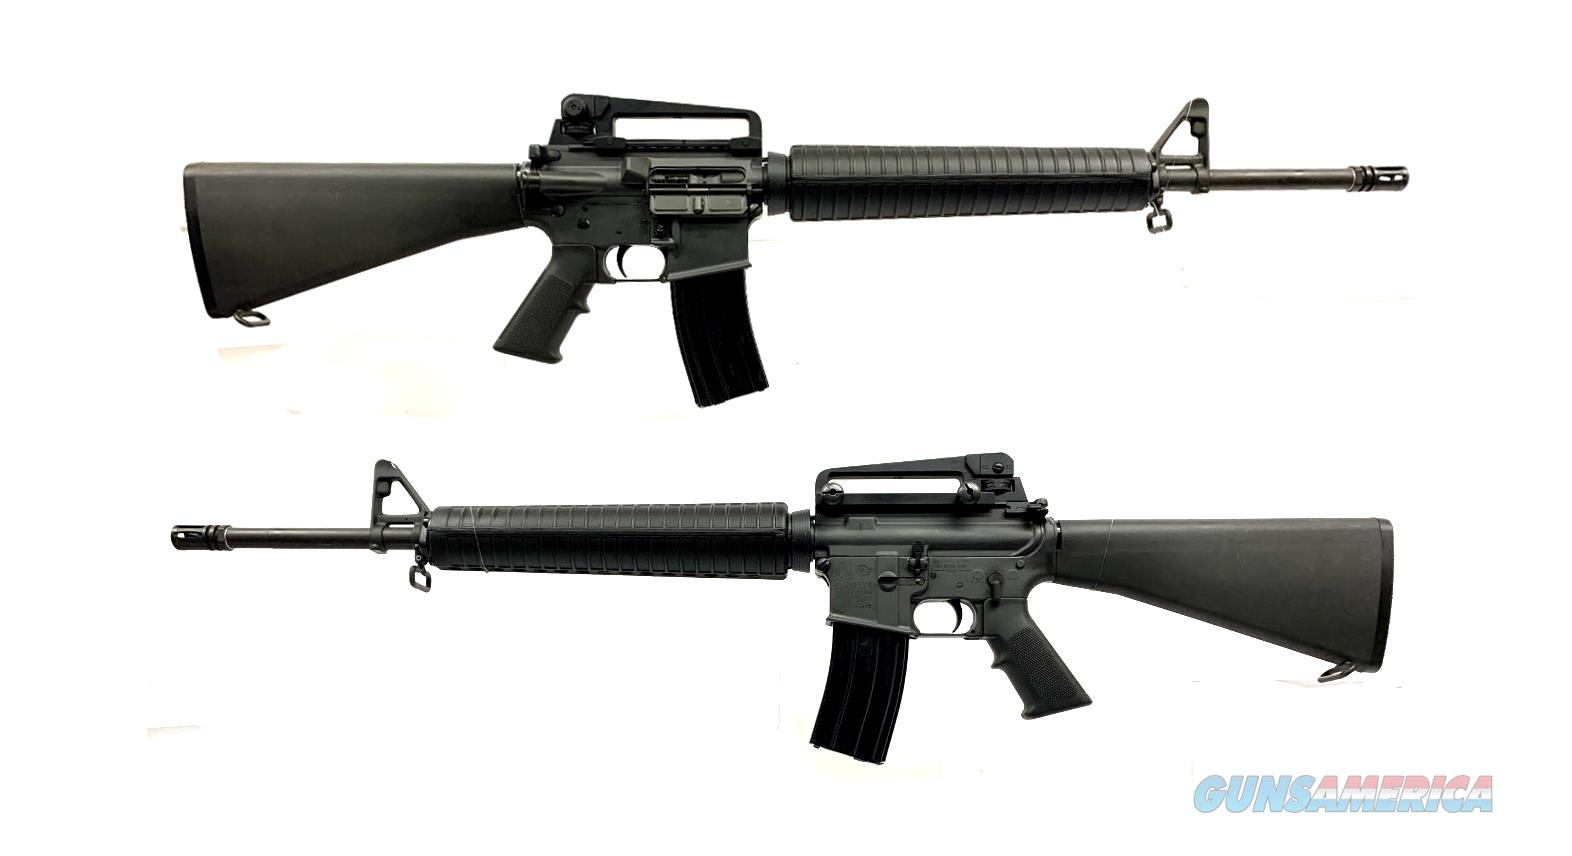 Colt Sporter Competition Pre-Ban Semi-Automatic Rifle  Guns > Rifles > Colt Military/Tactical Rifles